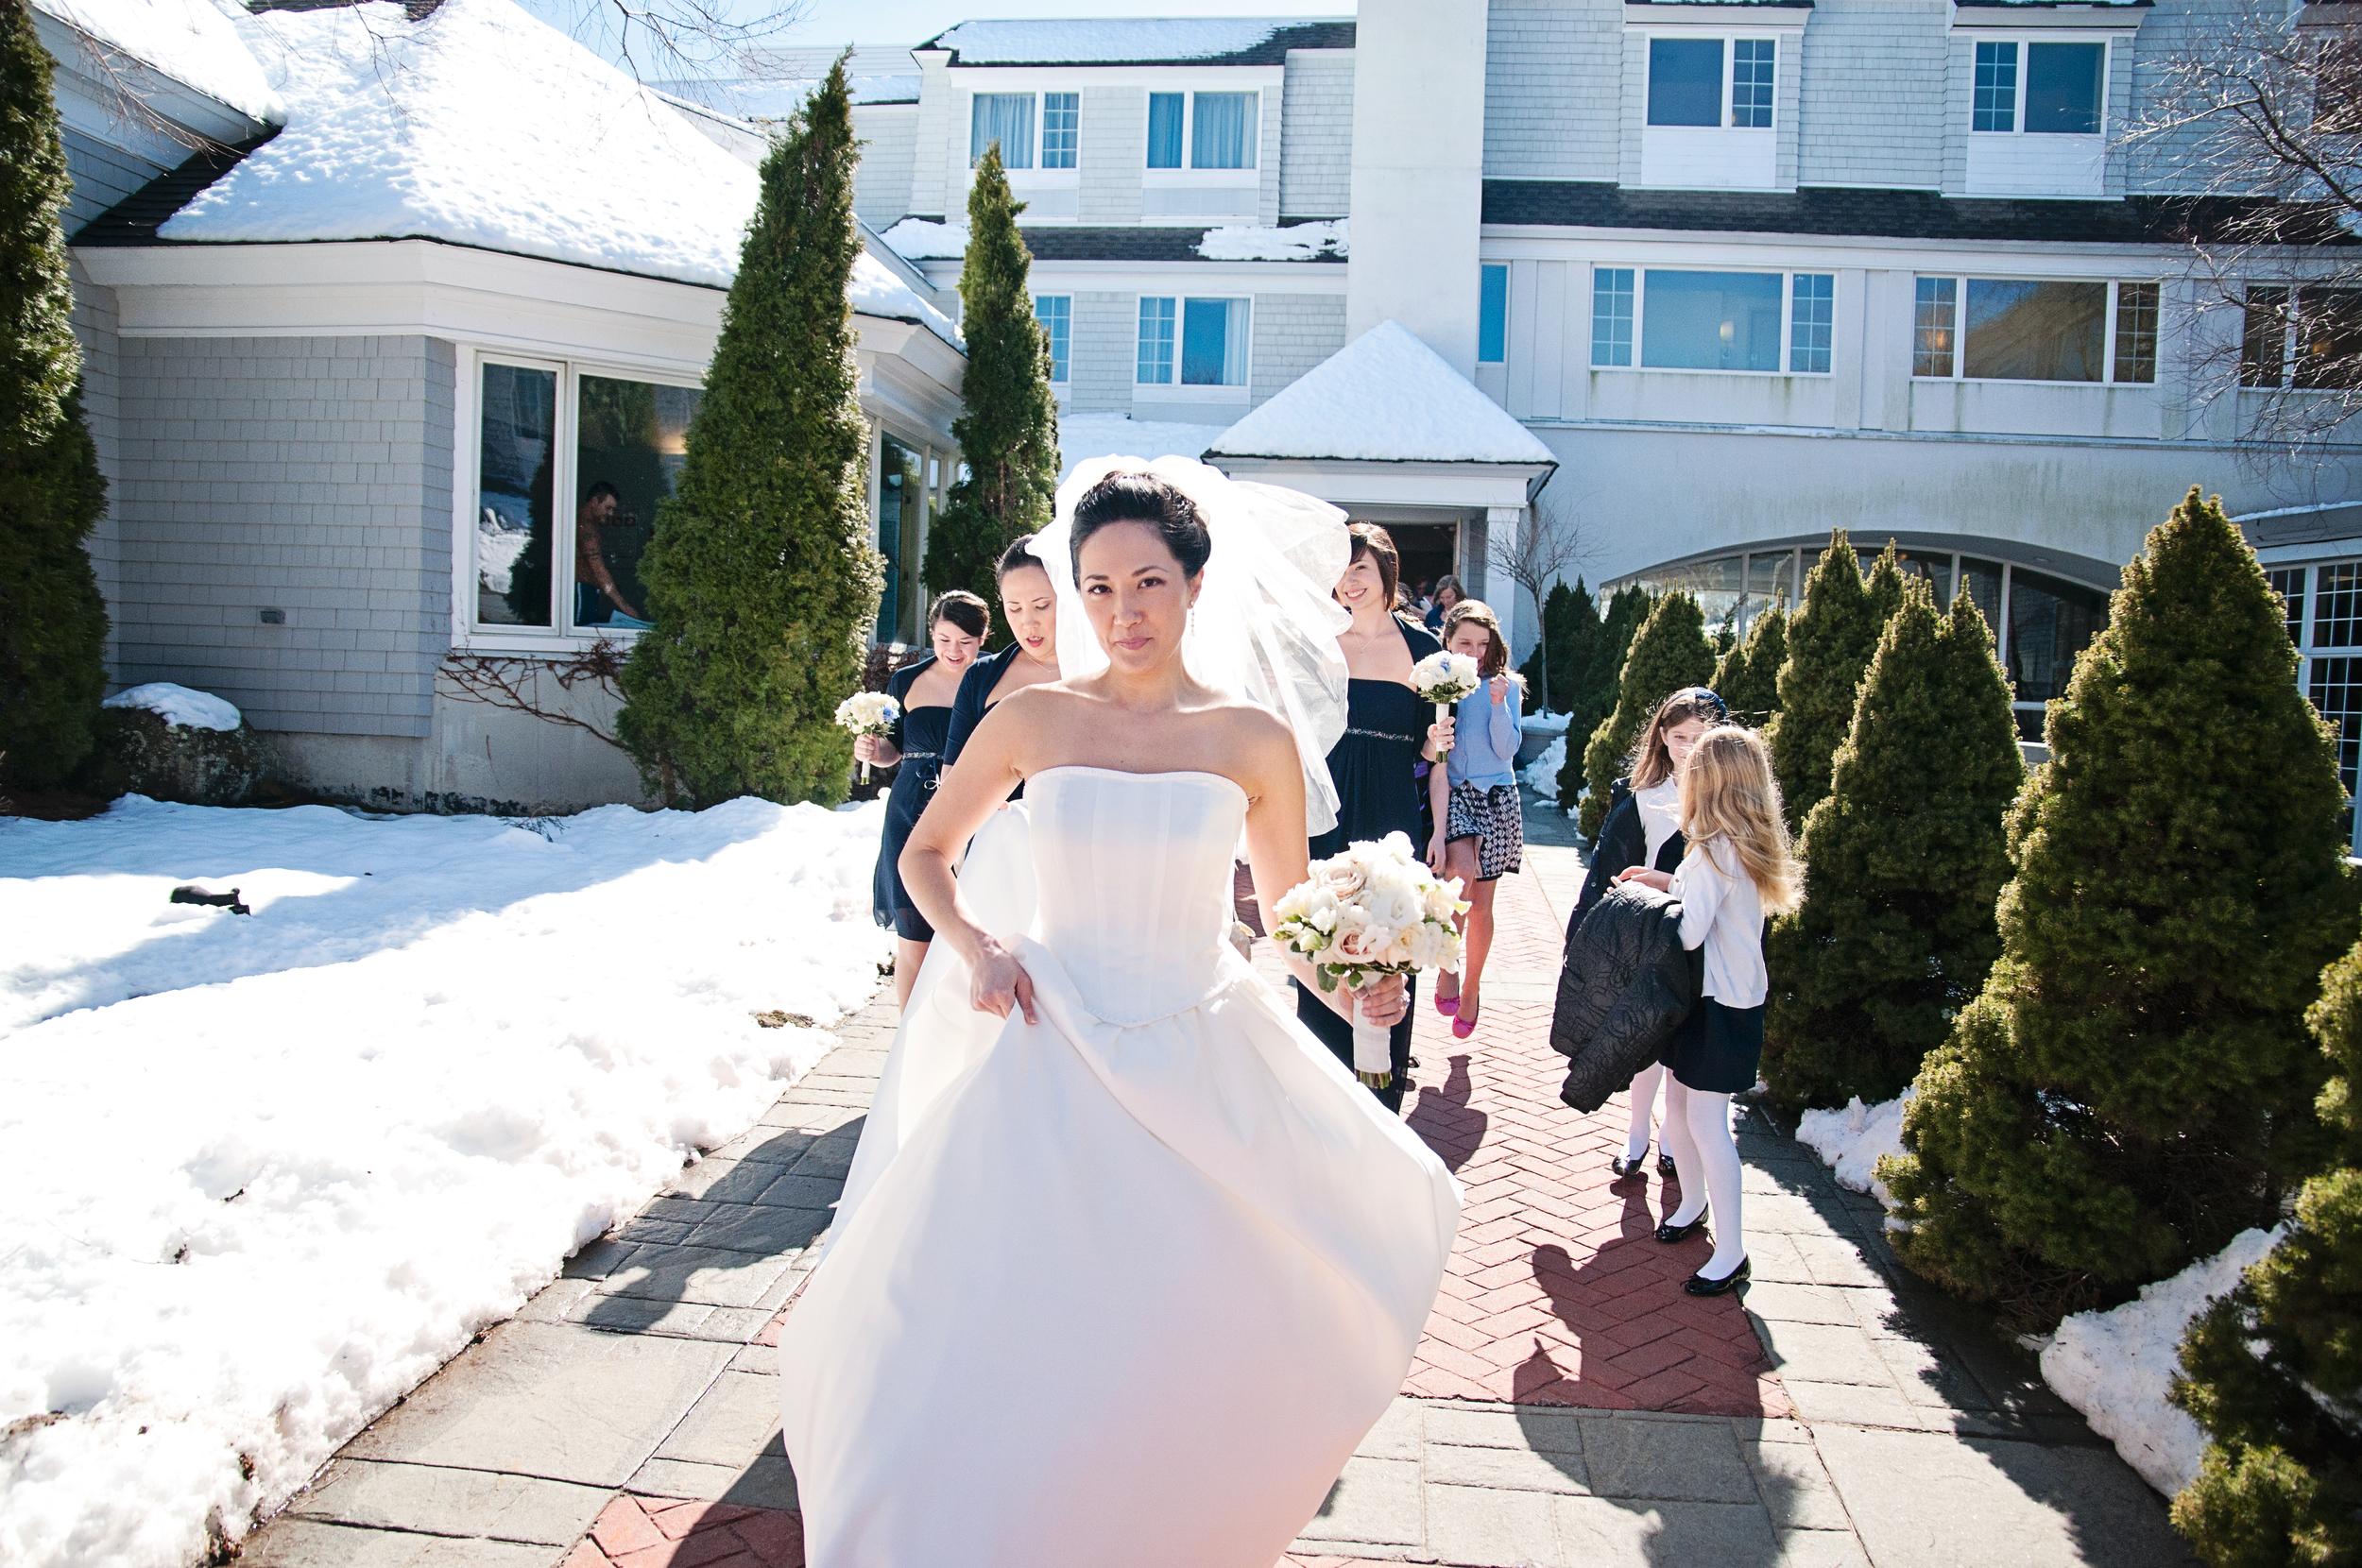 Angela_Chicoski_CT_wedding_photographer_049.jpg